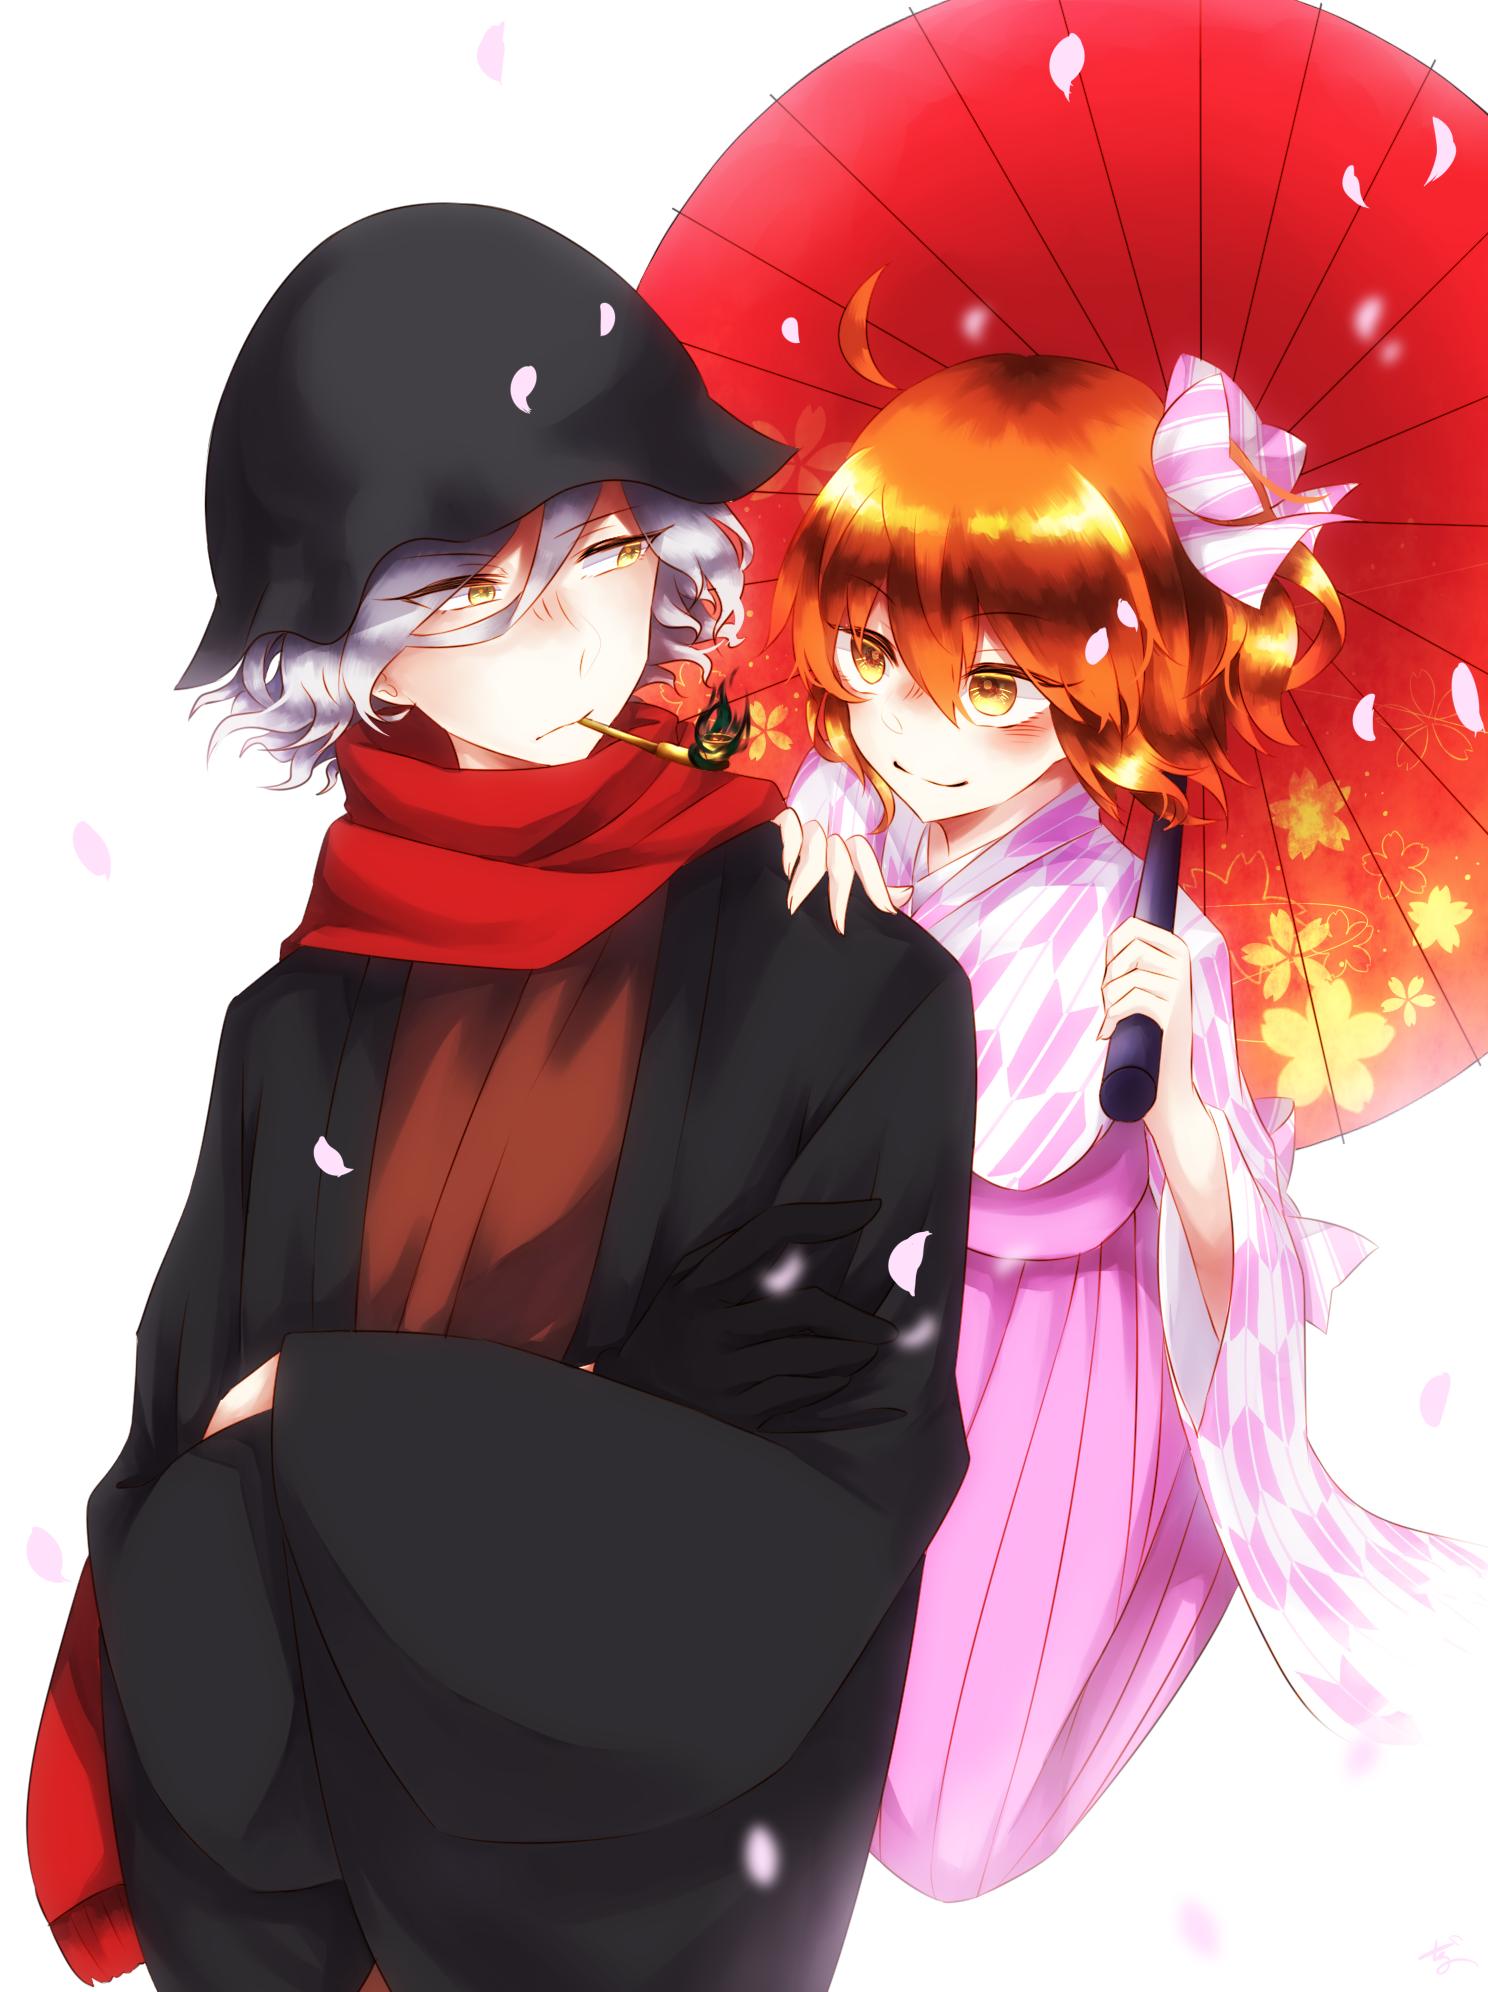 Gudako / Edmond Dantés【Fate/Grand Order】 Anime, Anime